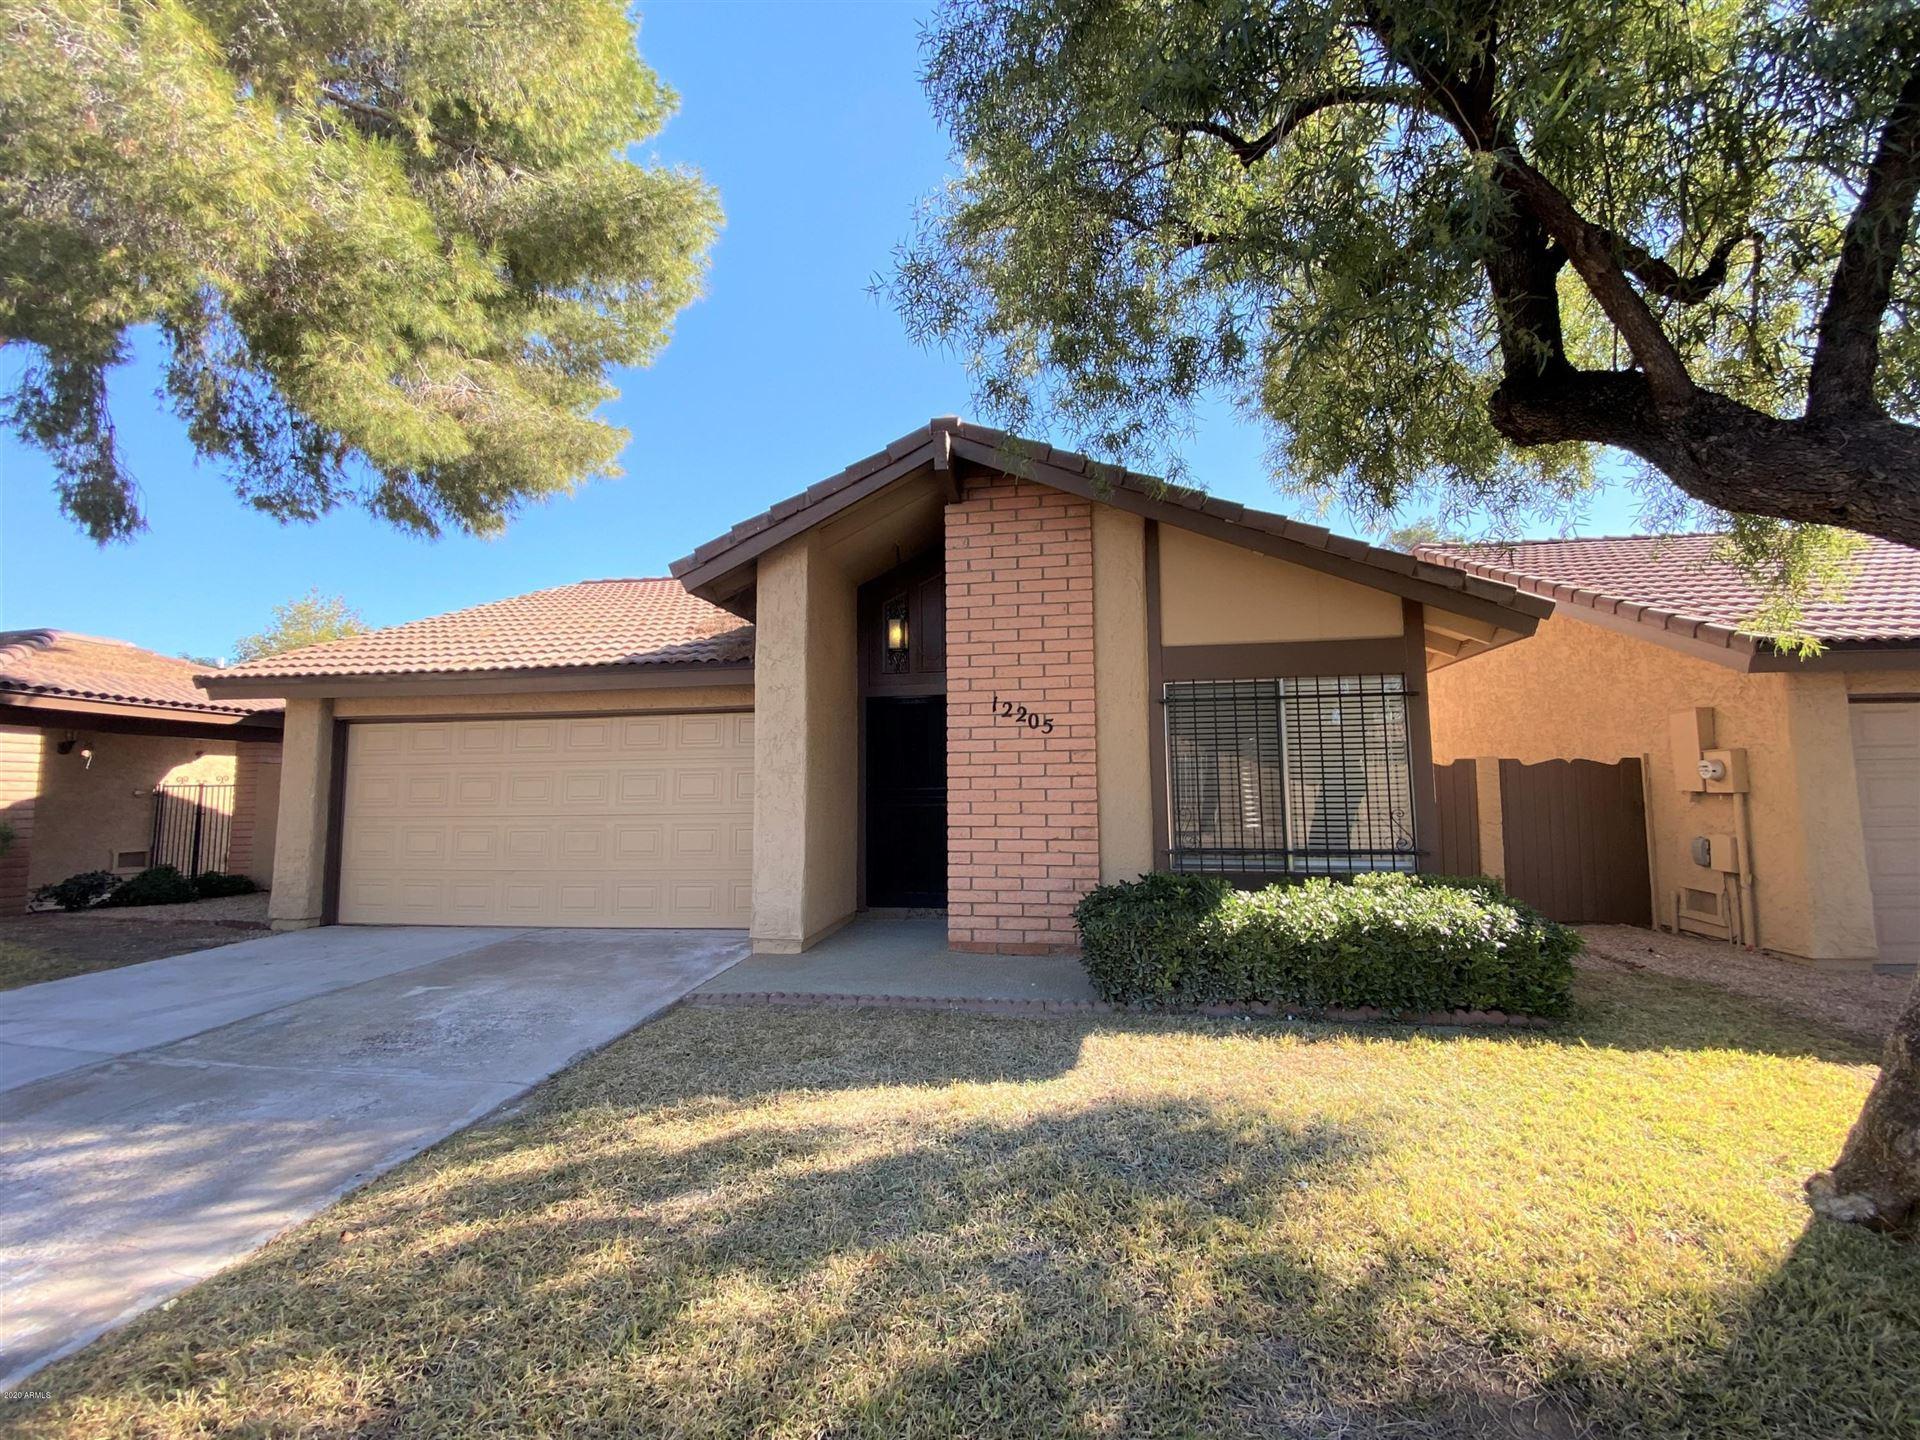 12205 S PAIUTE Street, Phoenix, AZ 85044 - MLS#: 6036654